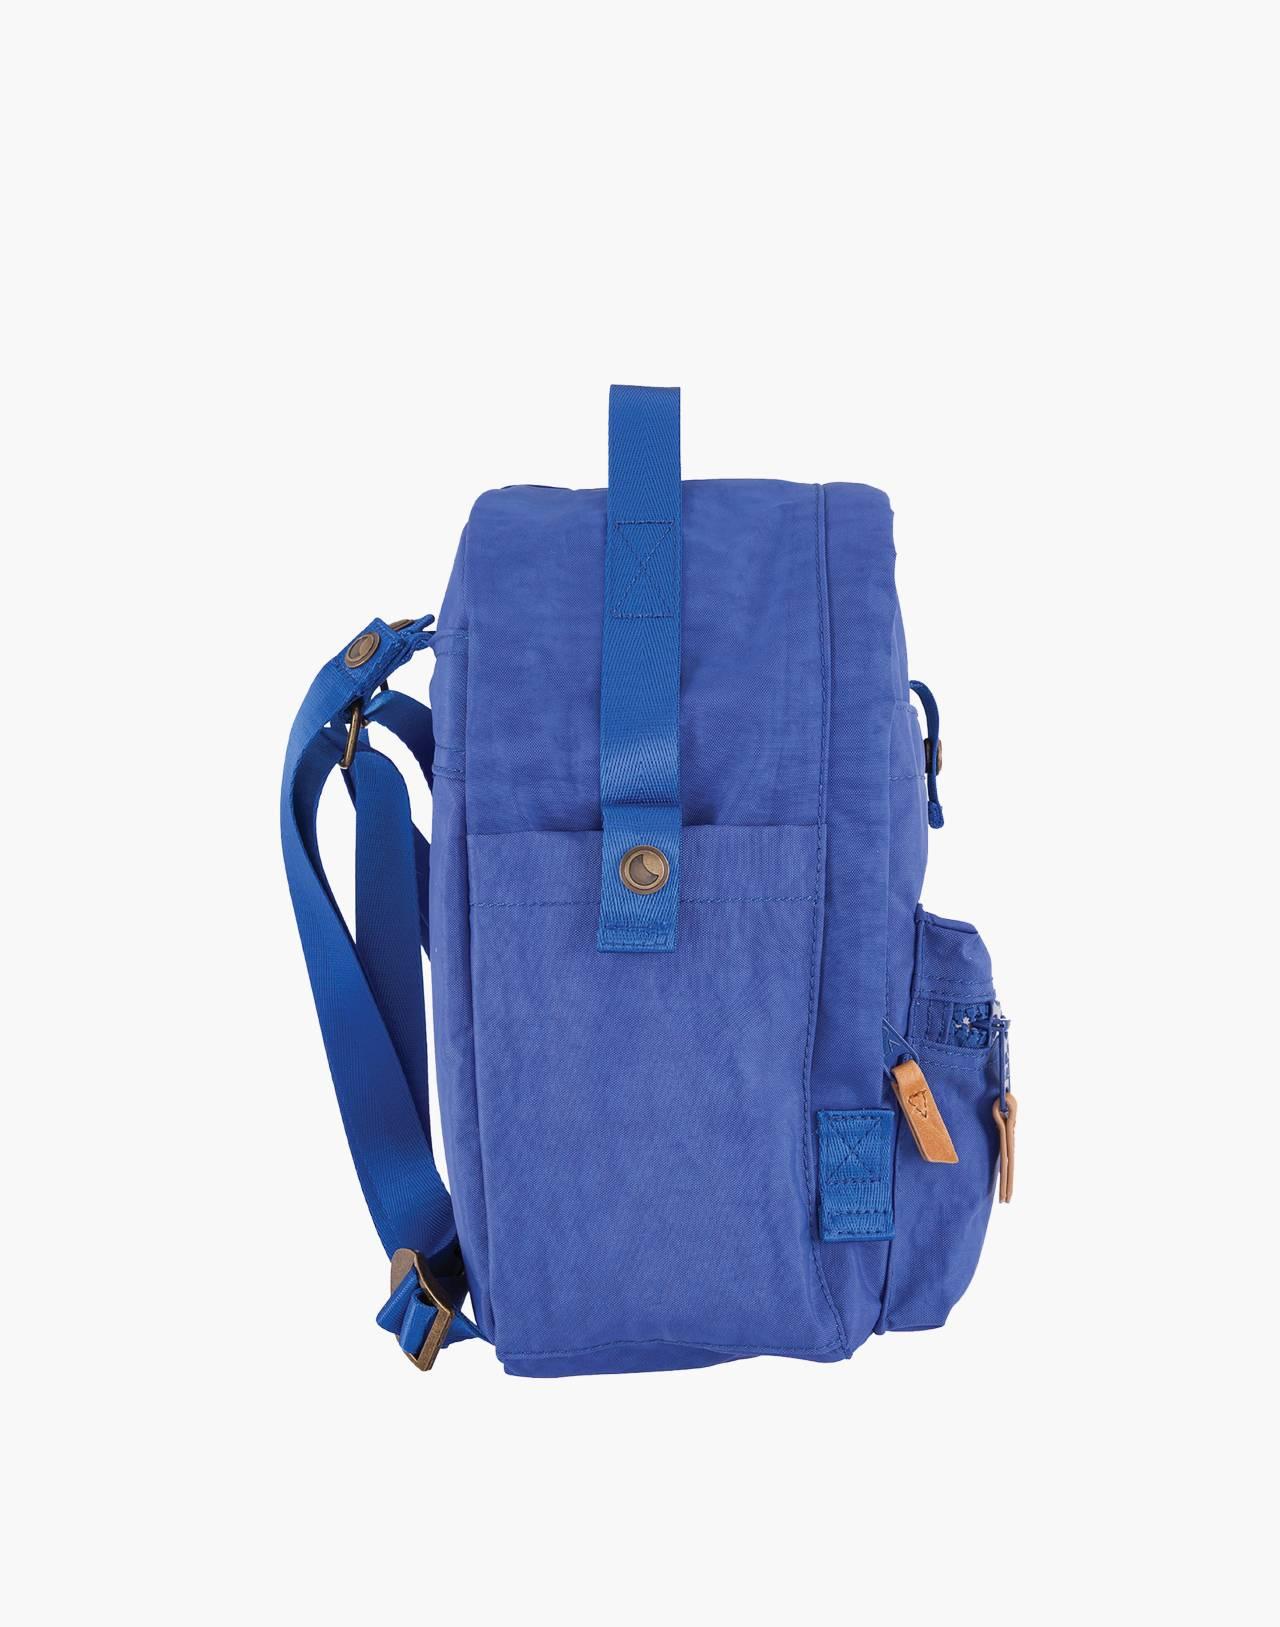 LOLA™ Mondo Utopian Small Backpack in blue image 3